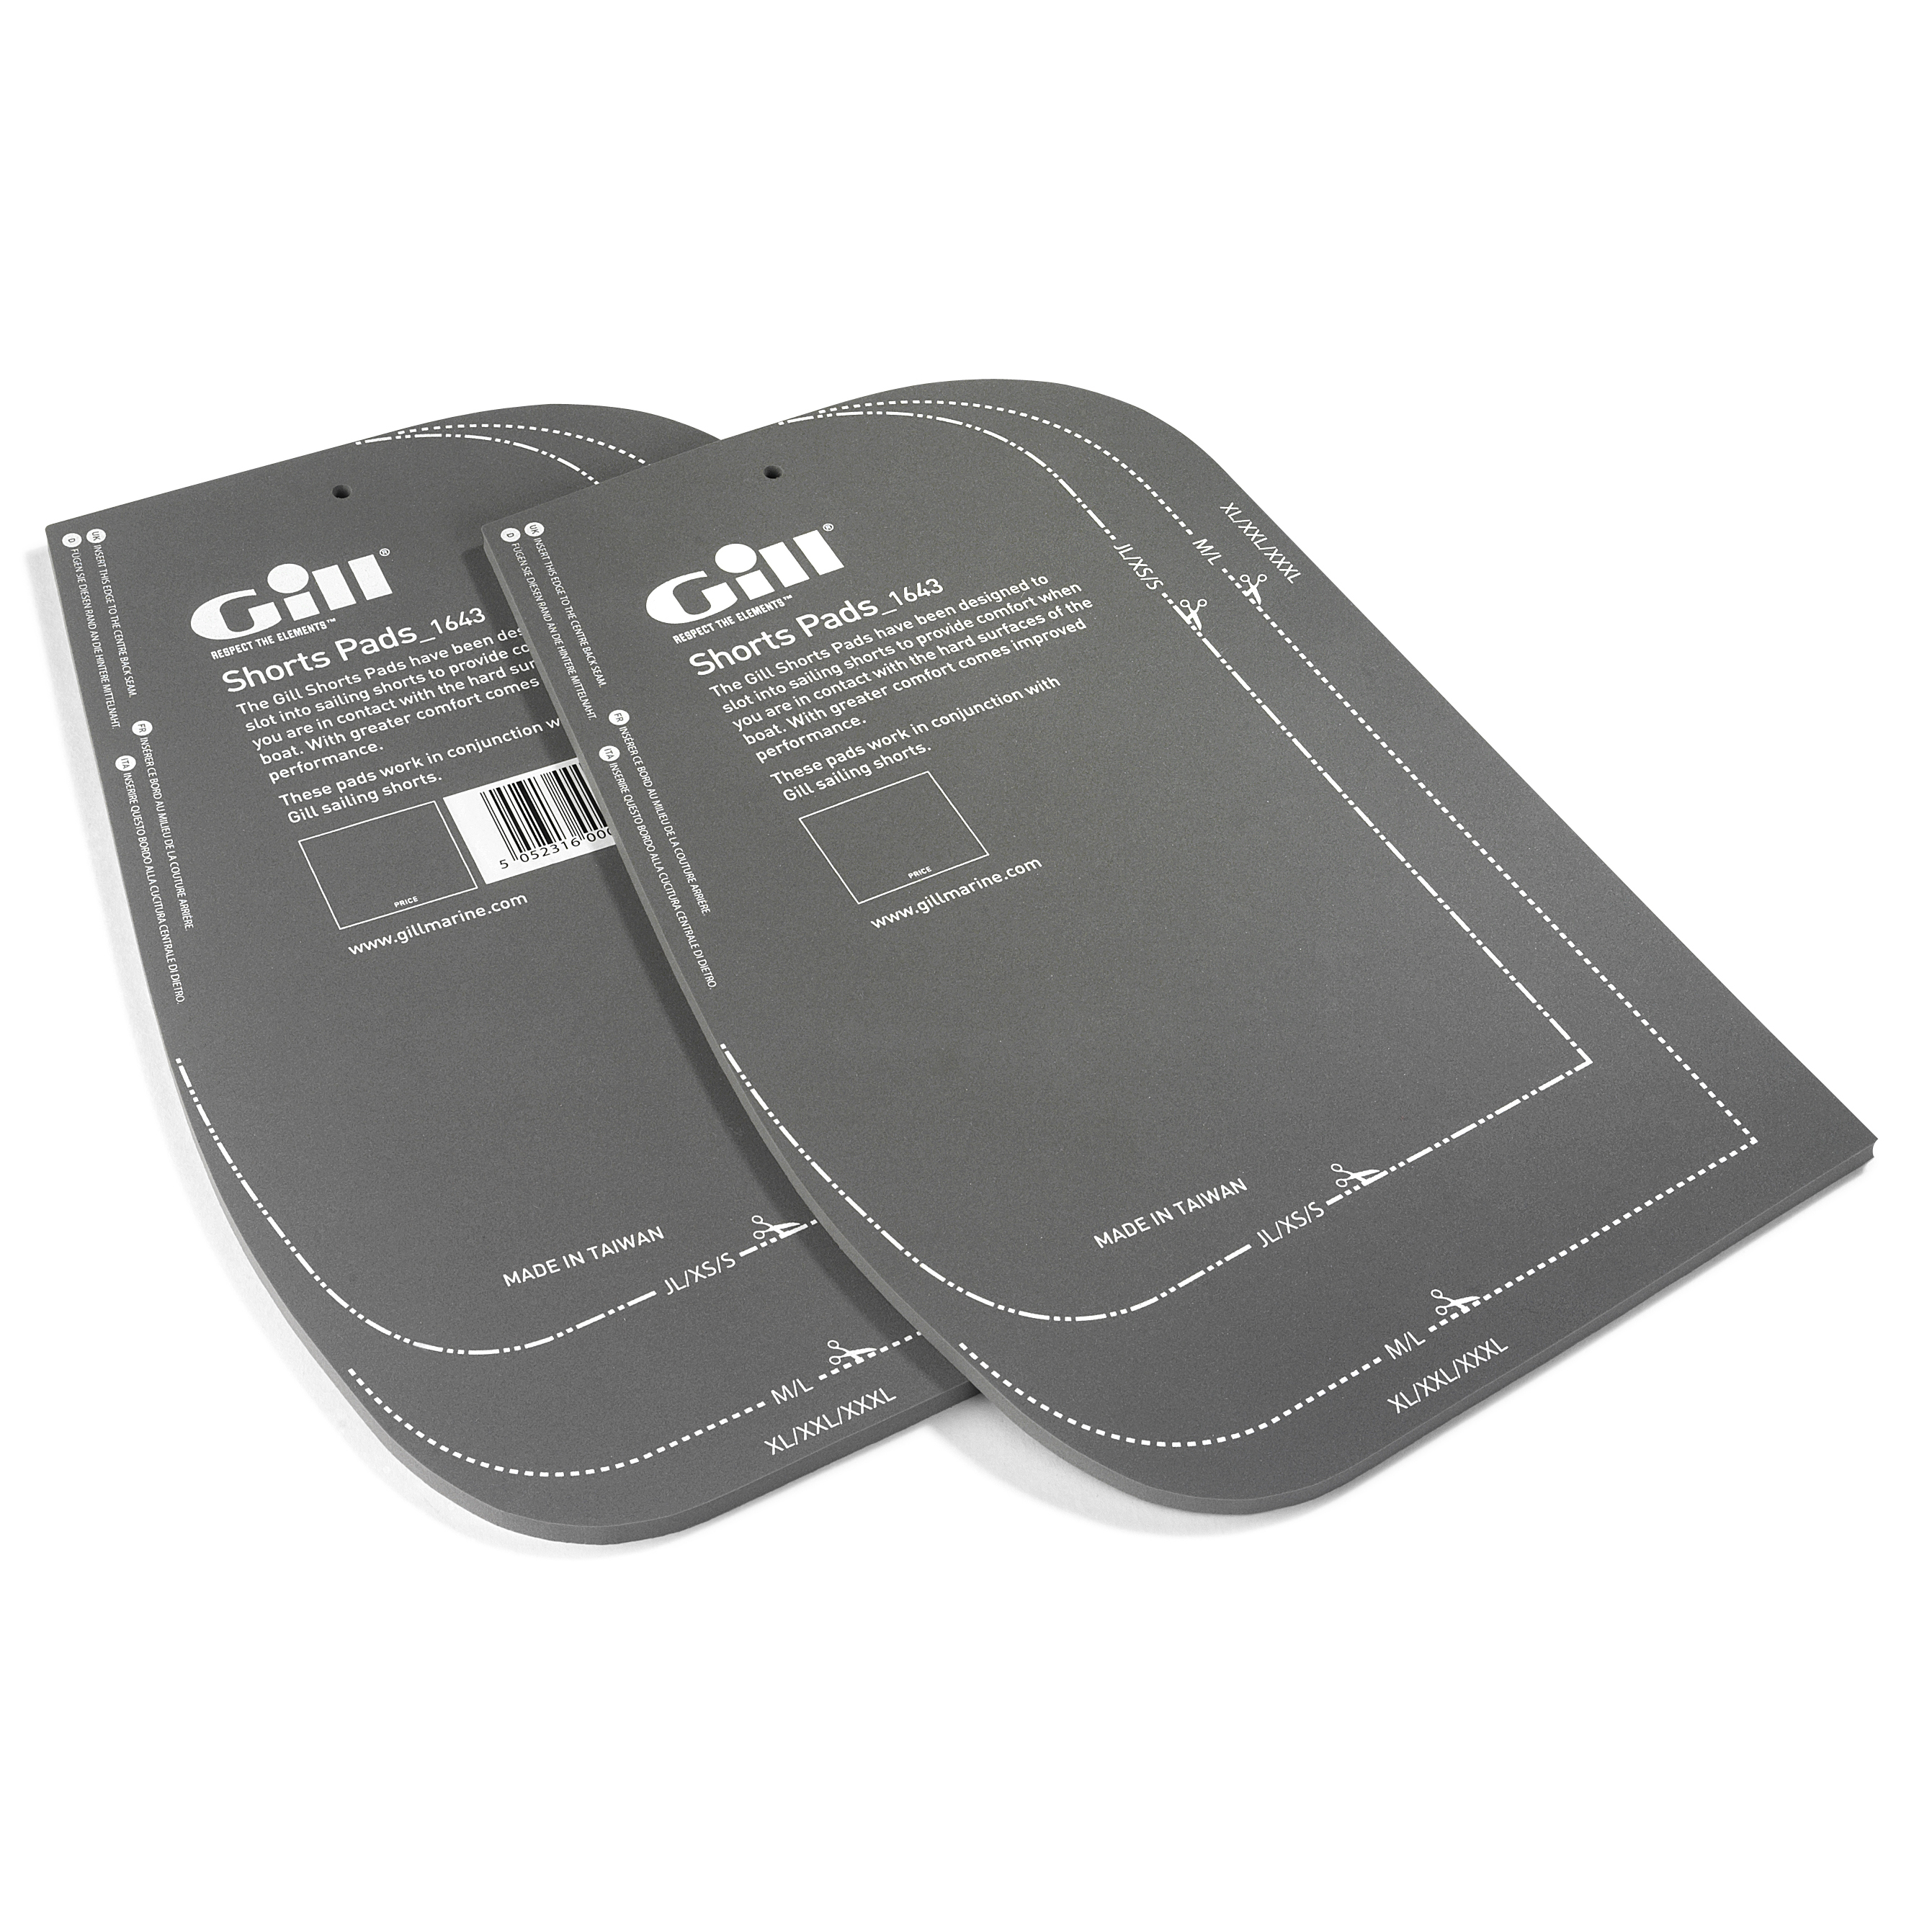 Seat Pads                                         - 1643-GRE01-1.jpg